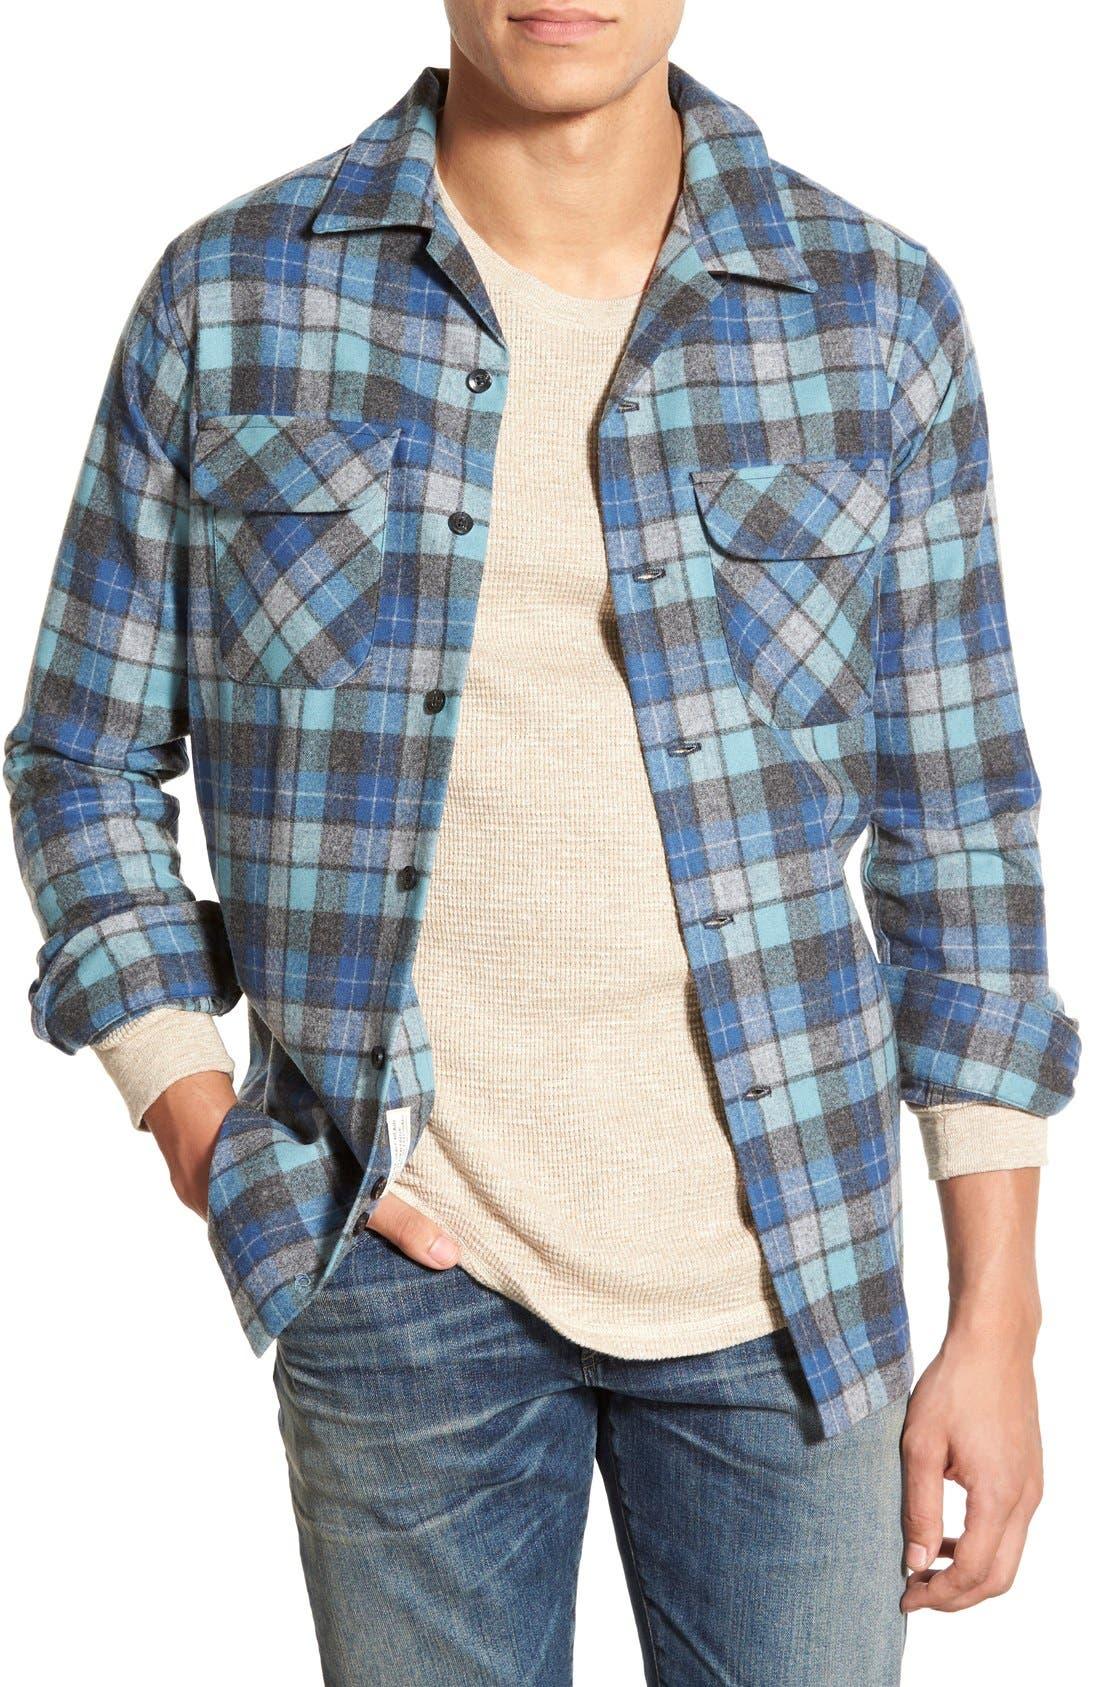 Main Image - Pendleton 'Board' Regular Fit Flannel Shirt